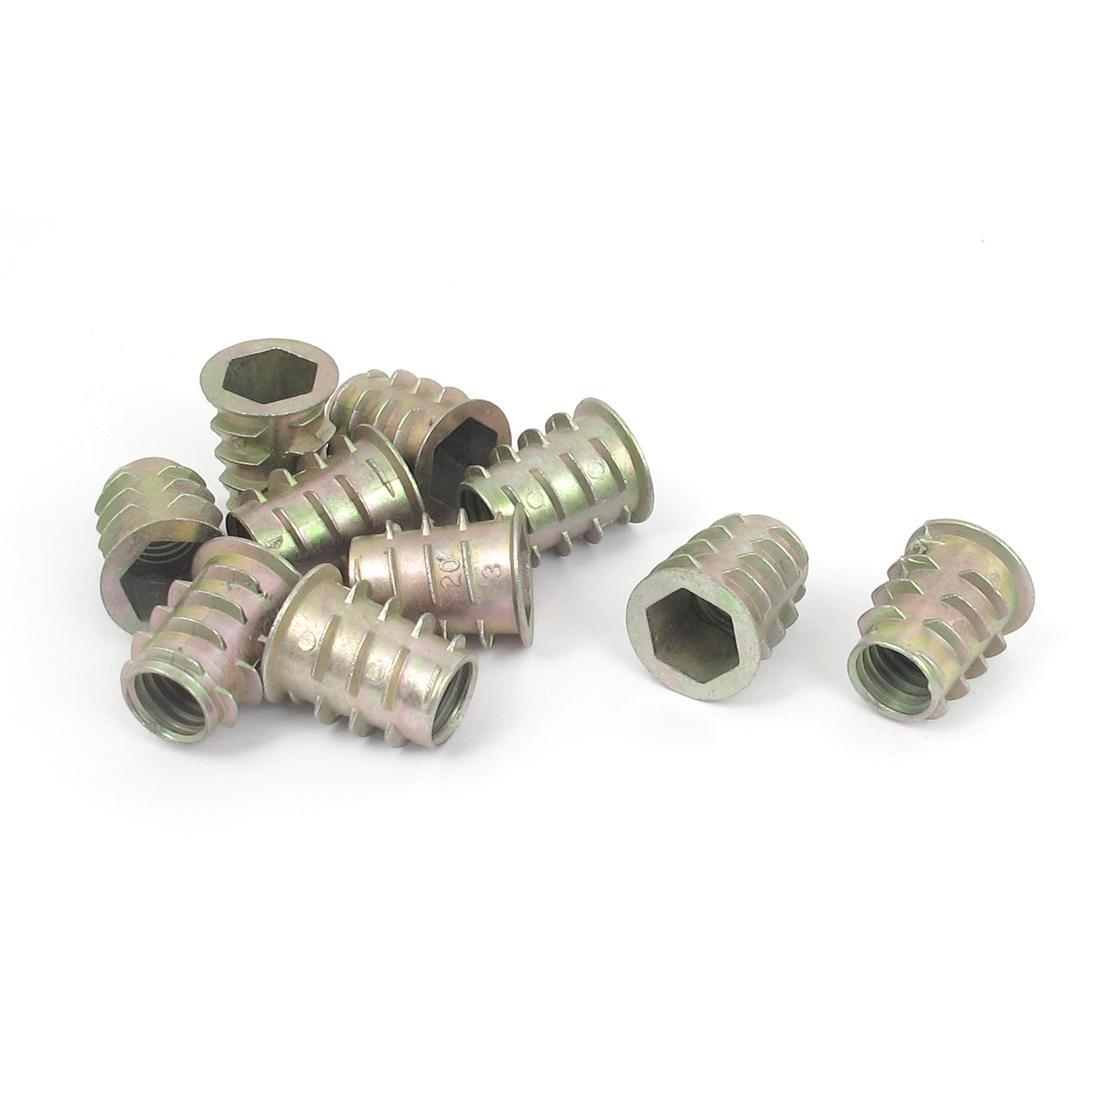 10 Pcs M10x20mm Zinc Plated Hex Socket Screw in Thread Insert Nut for Wood